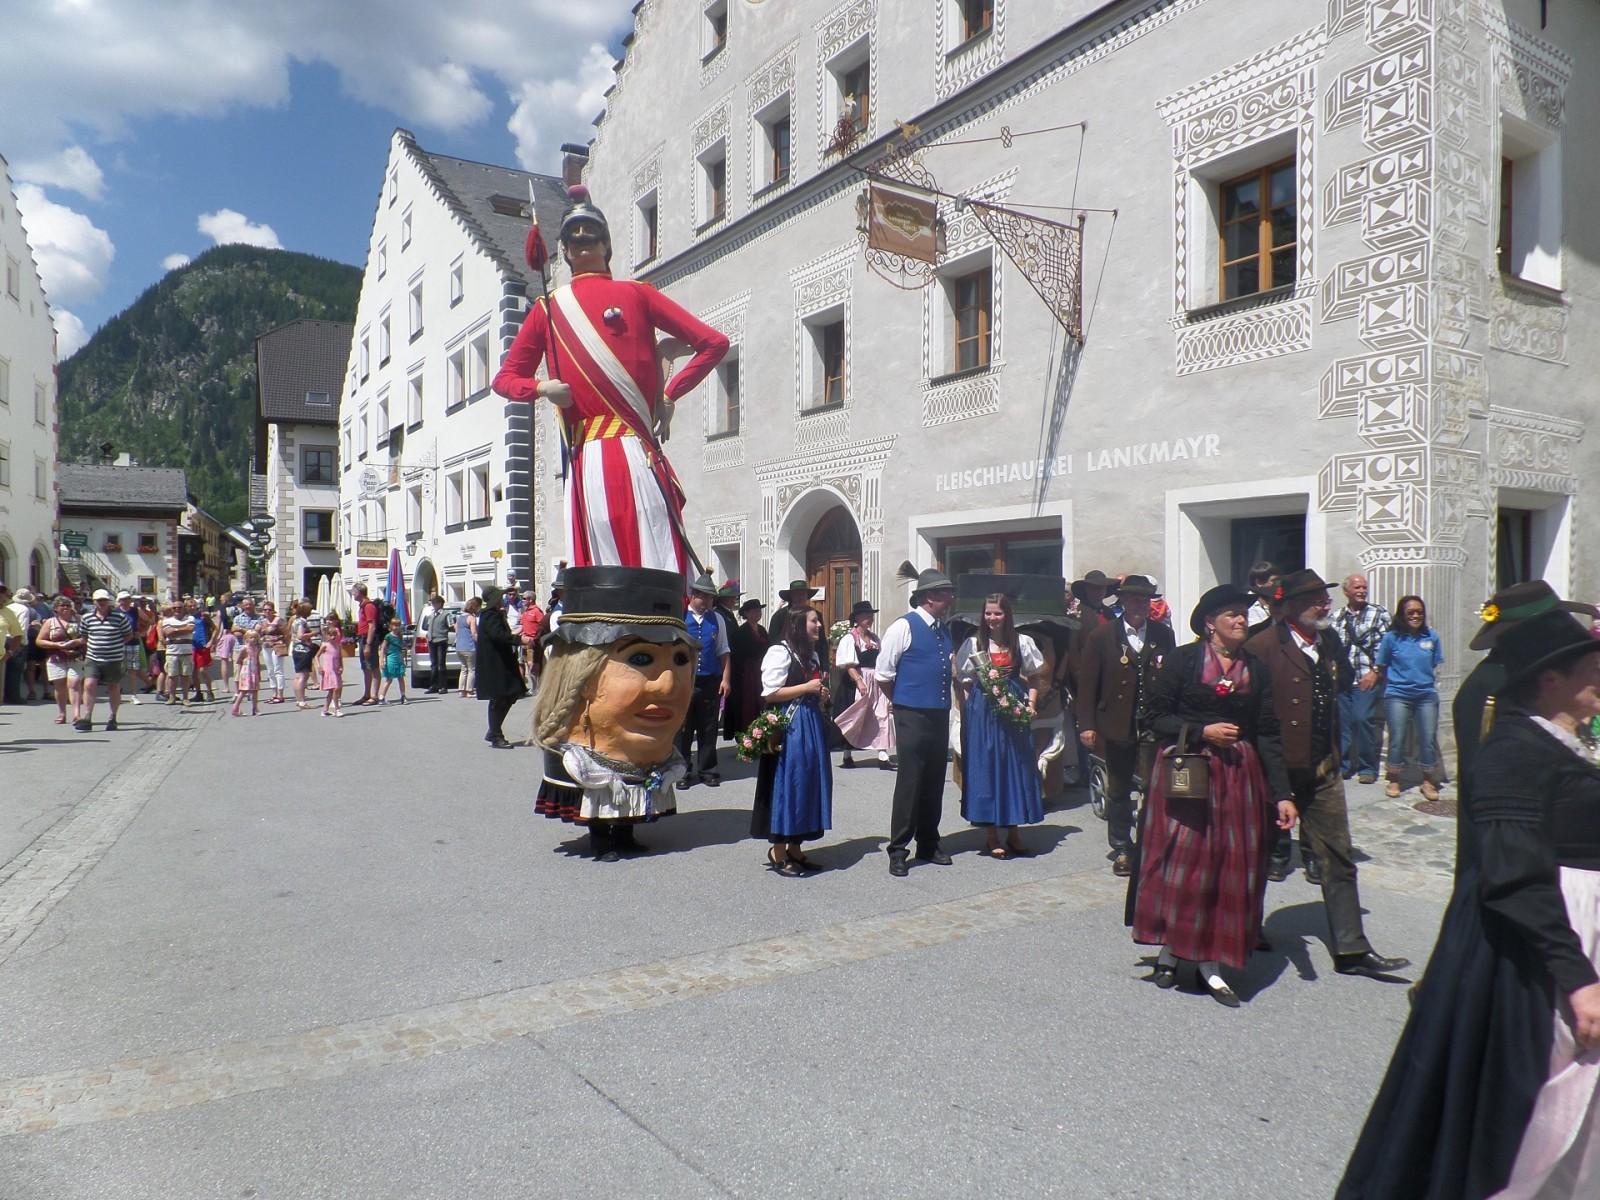 Samsonumzug in Mauterndorf